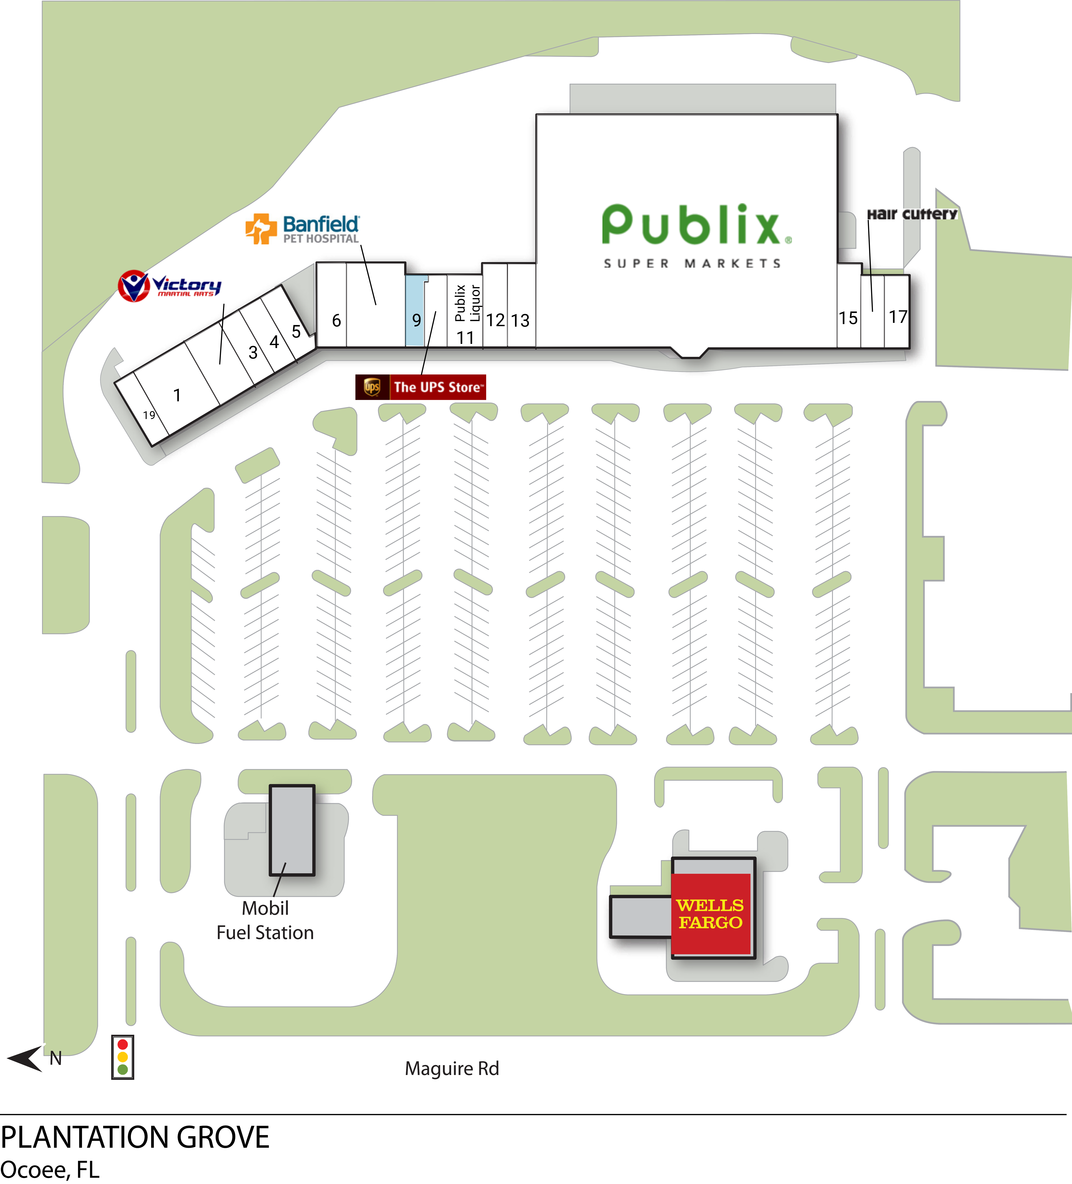 Ocoee FL: Plantation Grove - Retail Space - InvenTrust